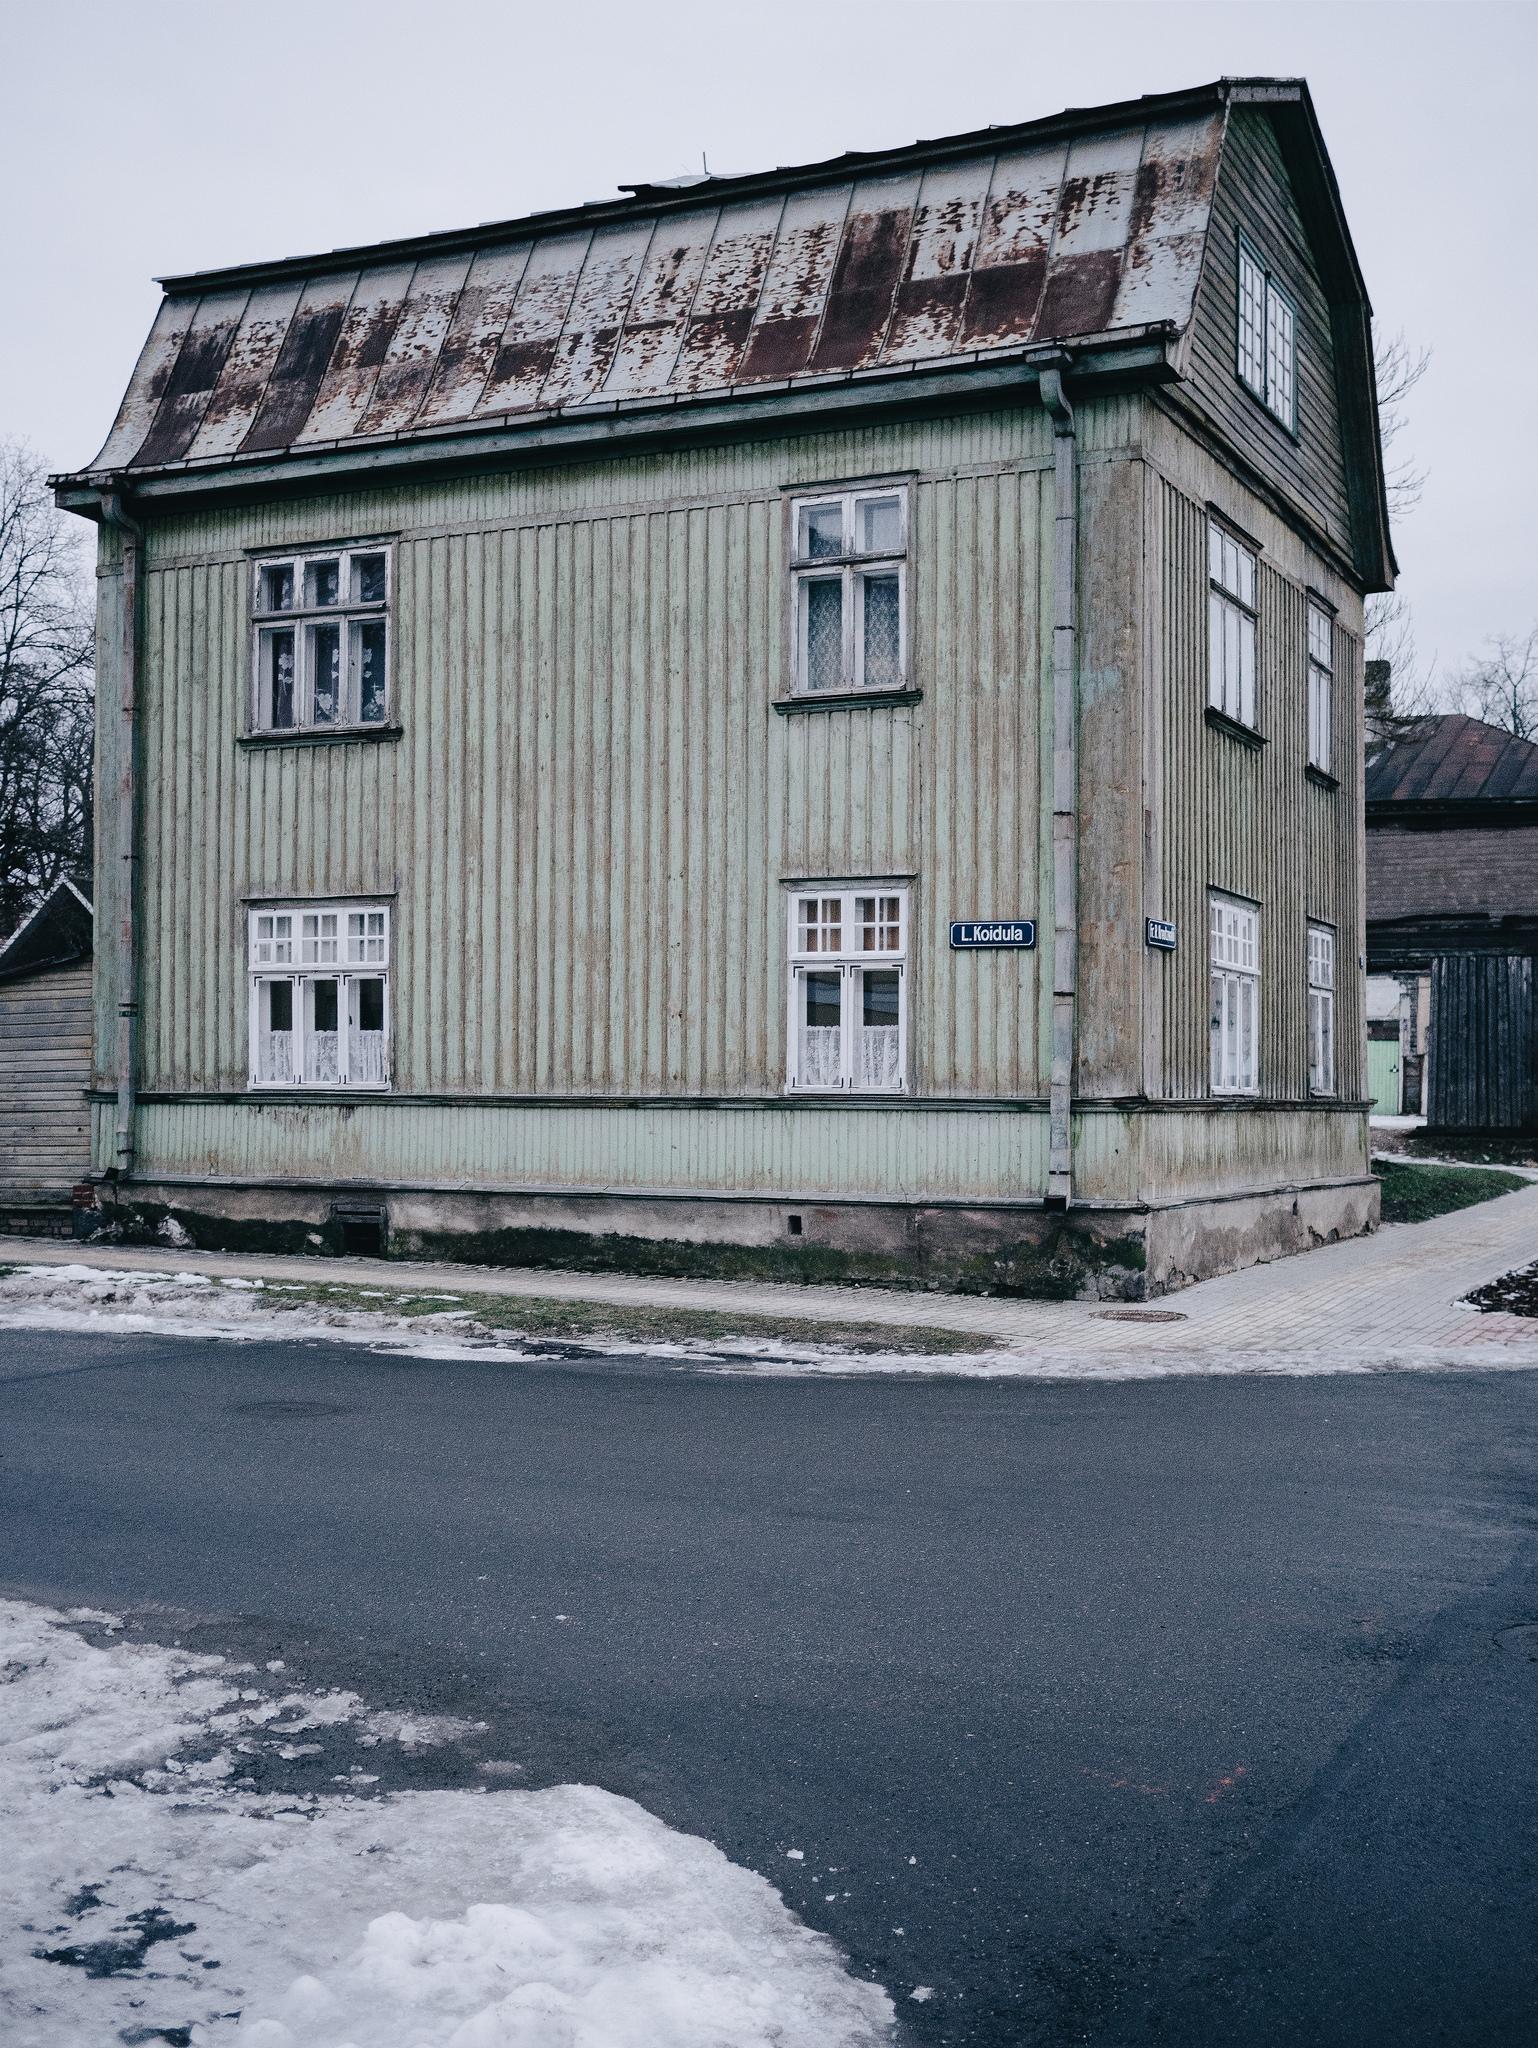 Corner of Koidula & Kreutzwaldi, Võru, Estonia. January 2015.